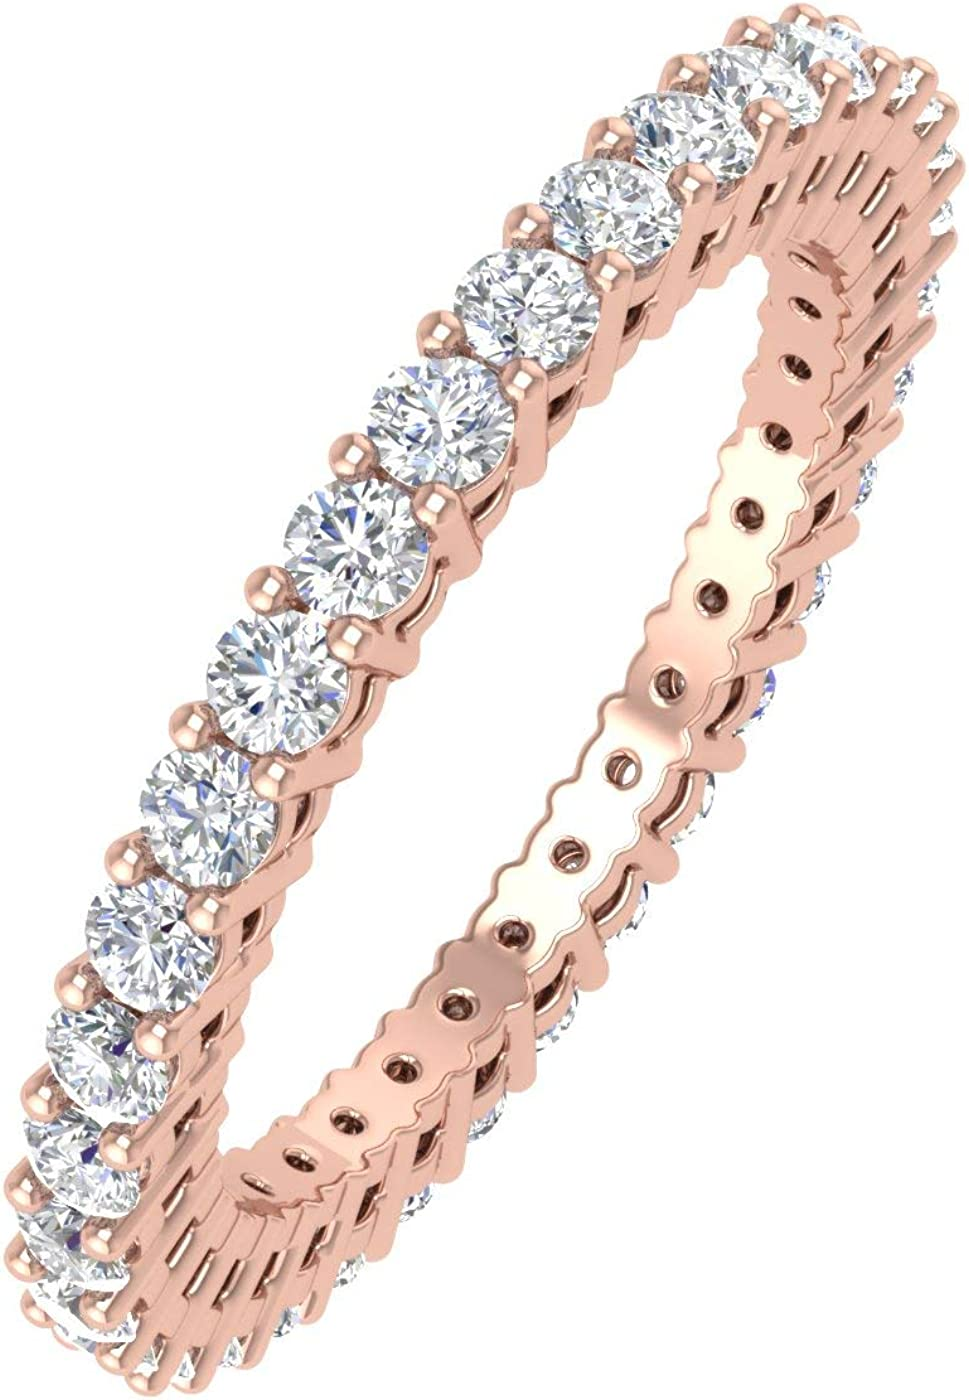 1 Carat Diamond Eternity Wedding Band in 14K Gold